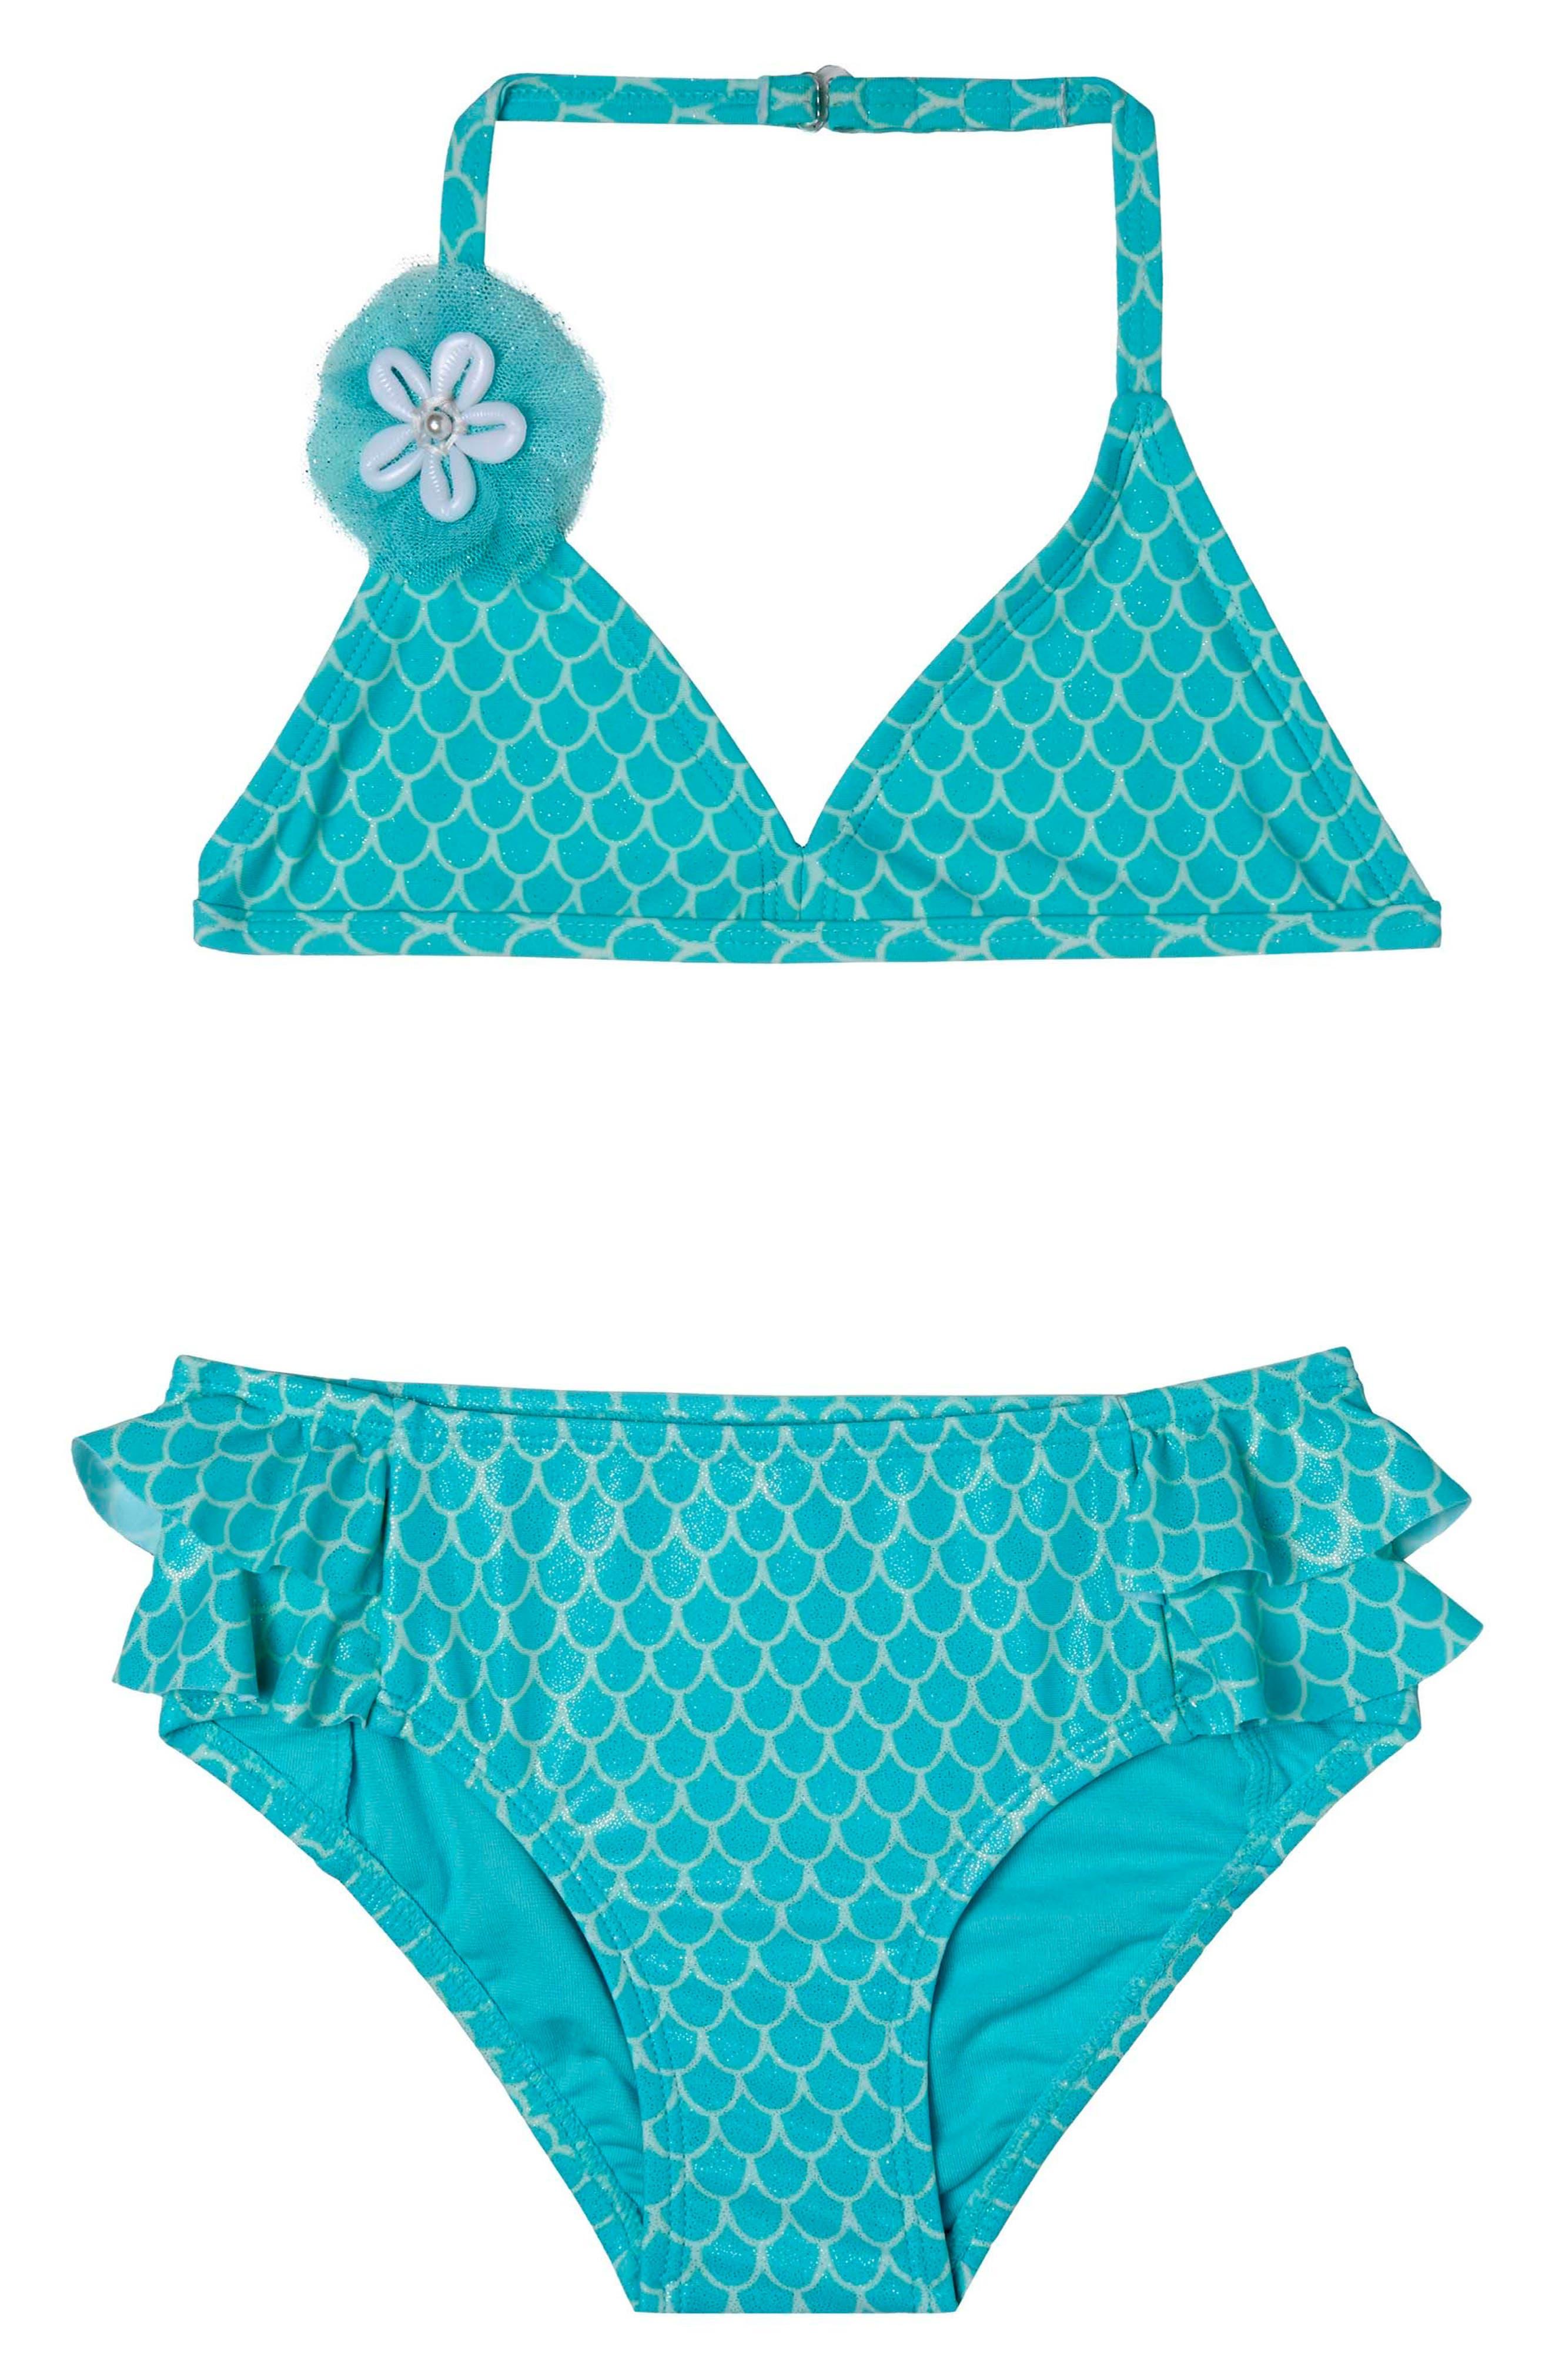 Mermaid Princess Two-Piece Swimsuit,                             Main thumbnail 1, color,                             Aqua